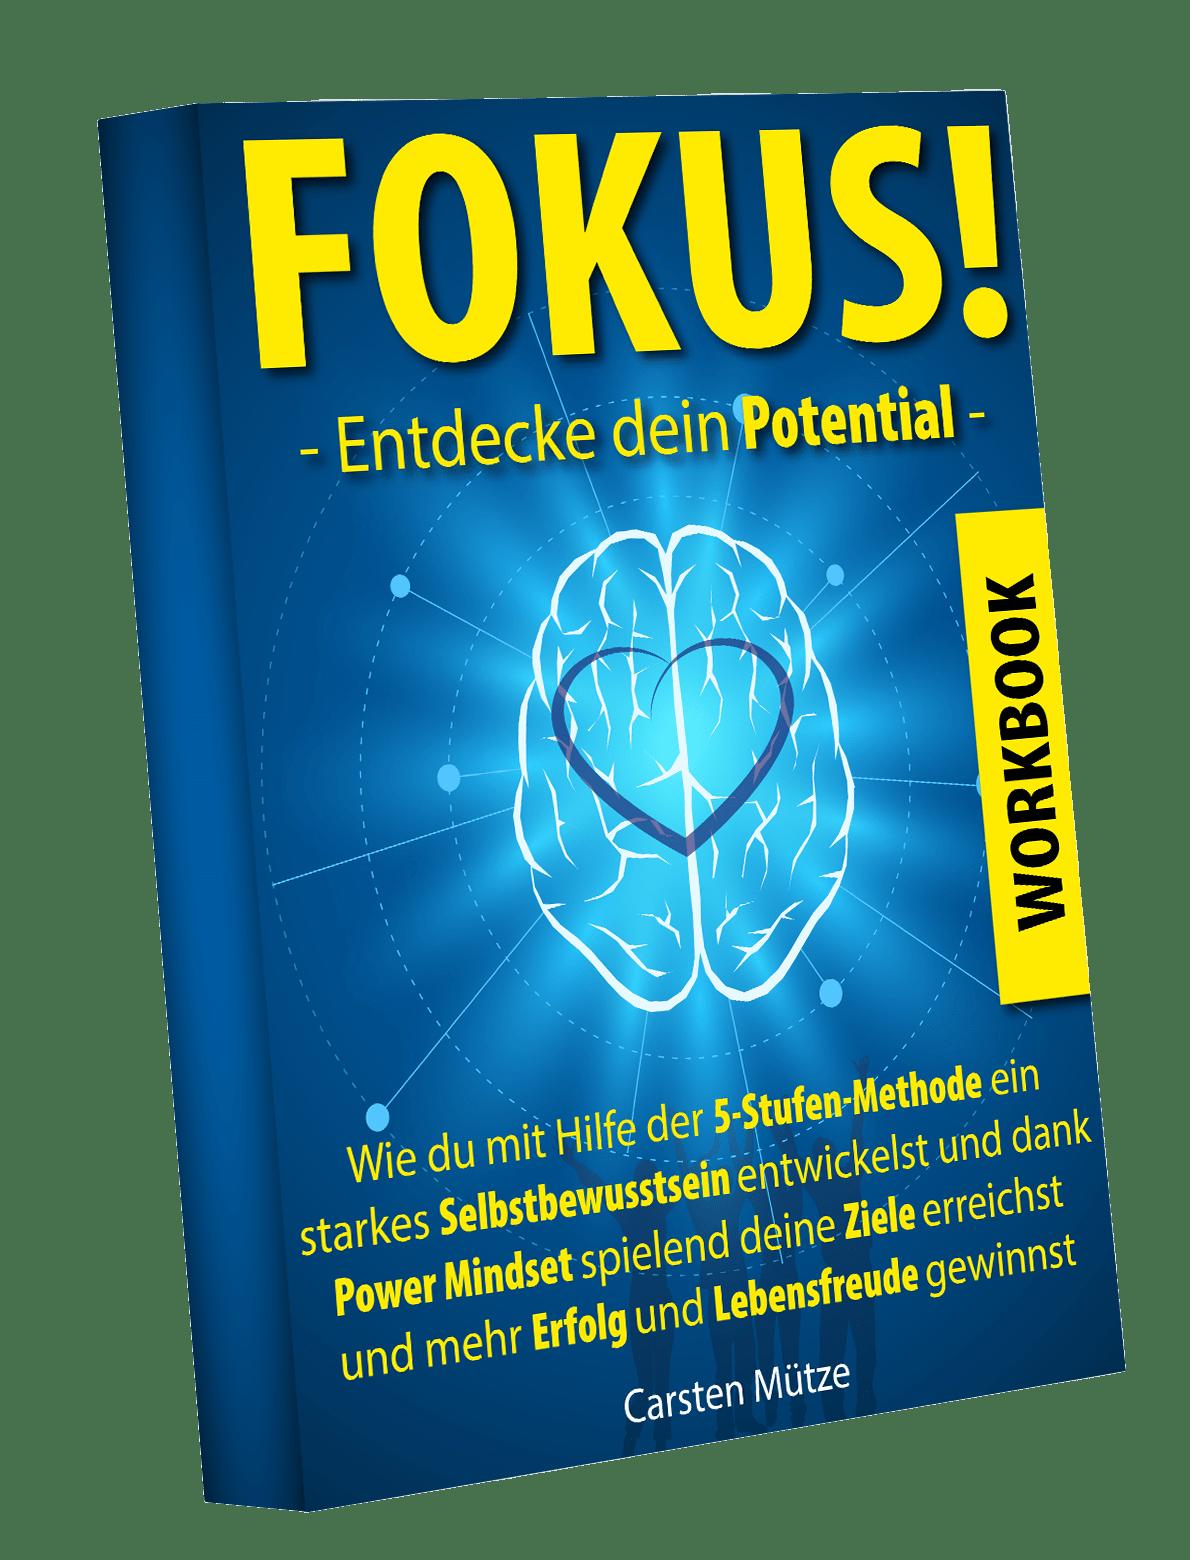 Carsten Mütze MOCKUP Workbook Potential 1